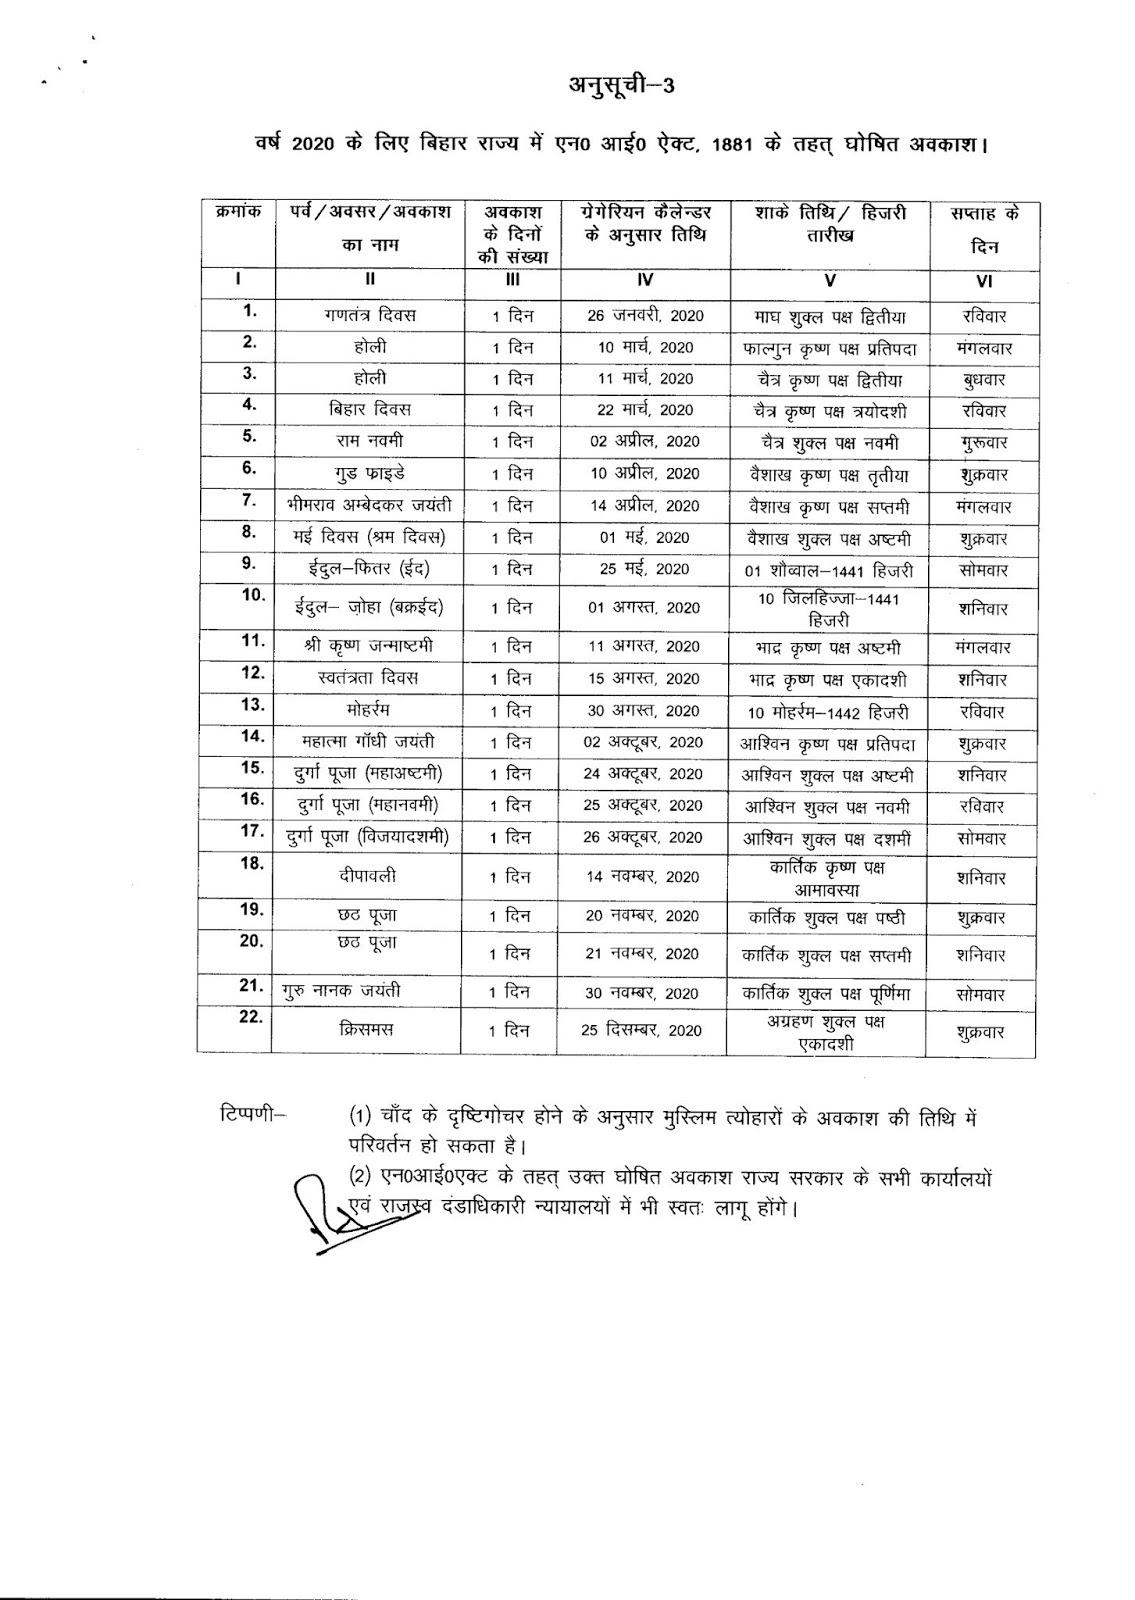 Bihar Government Calendar 2020 #educratsweb with regard to Govt Of Bihar Calendar 2020